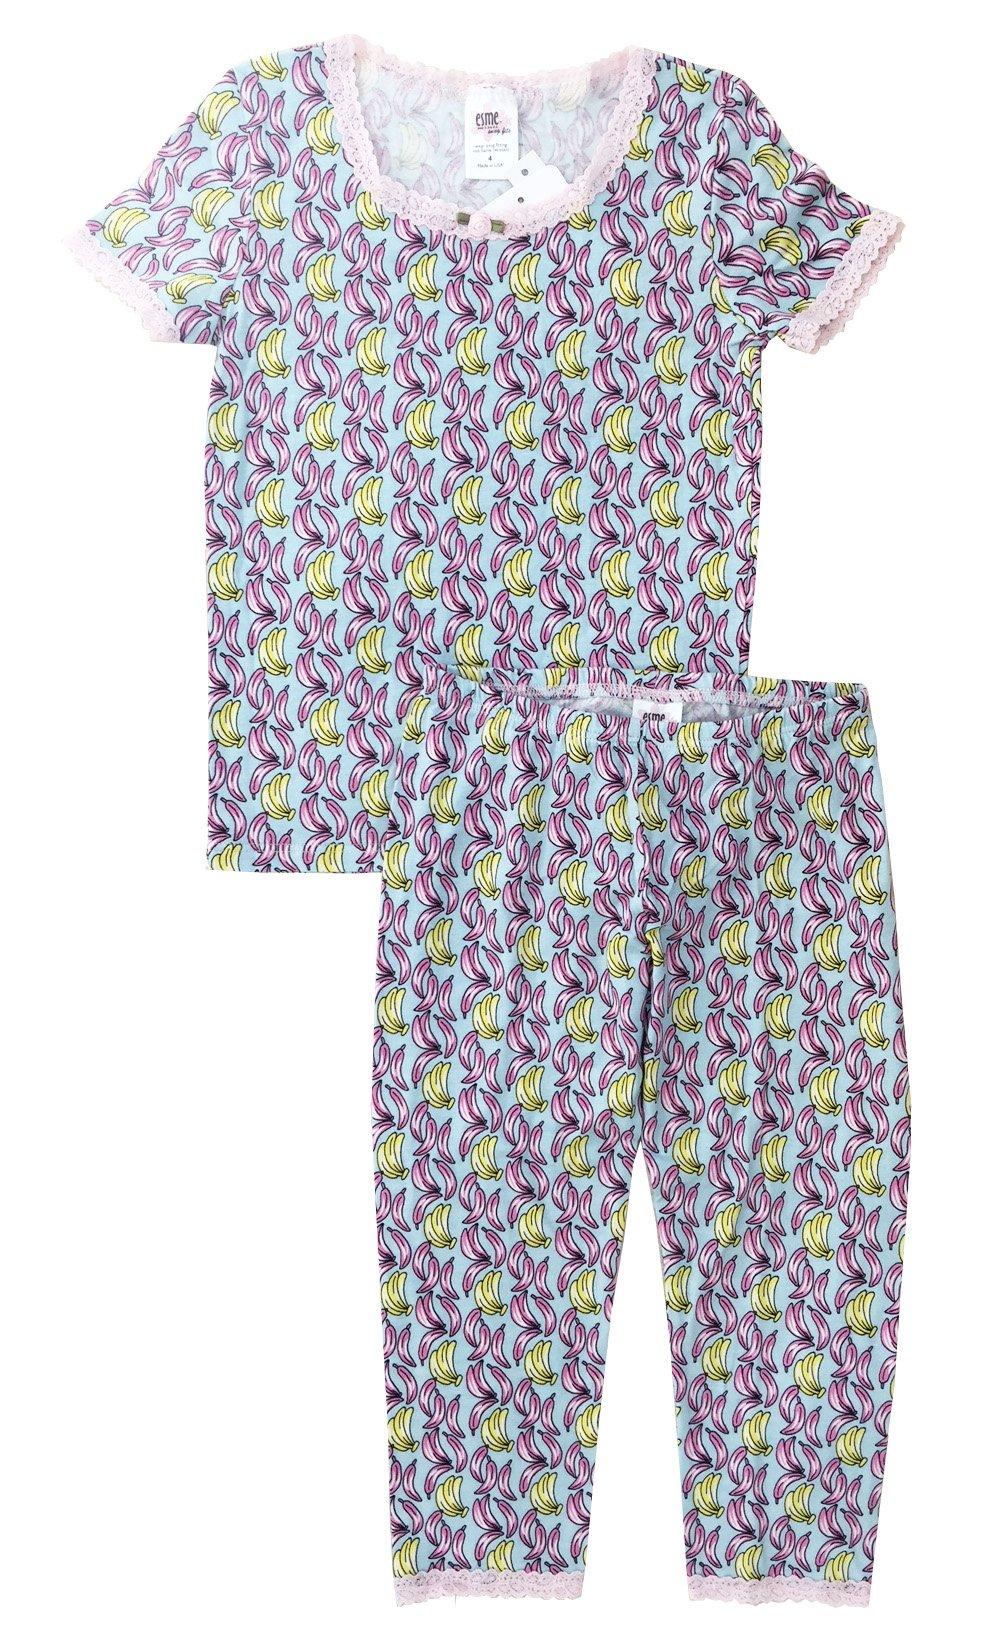 Esme Girl's Sleepwear Short Sleeve Top Leggings Set 5 Banana